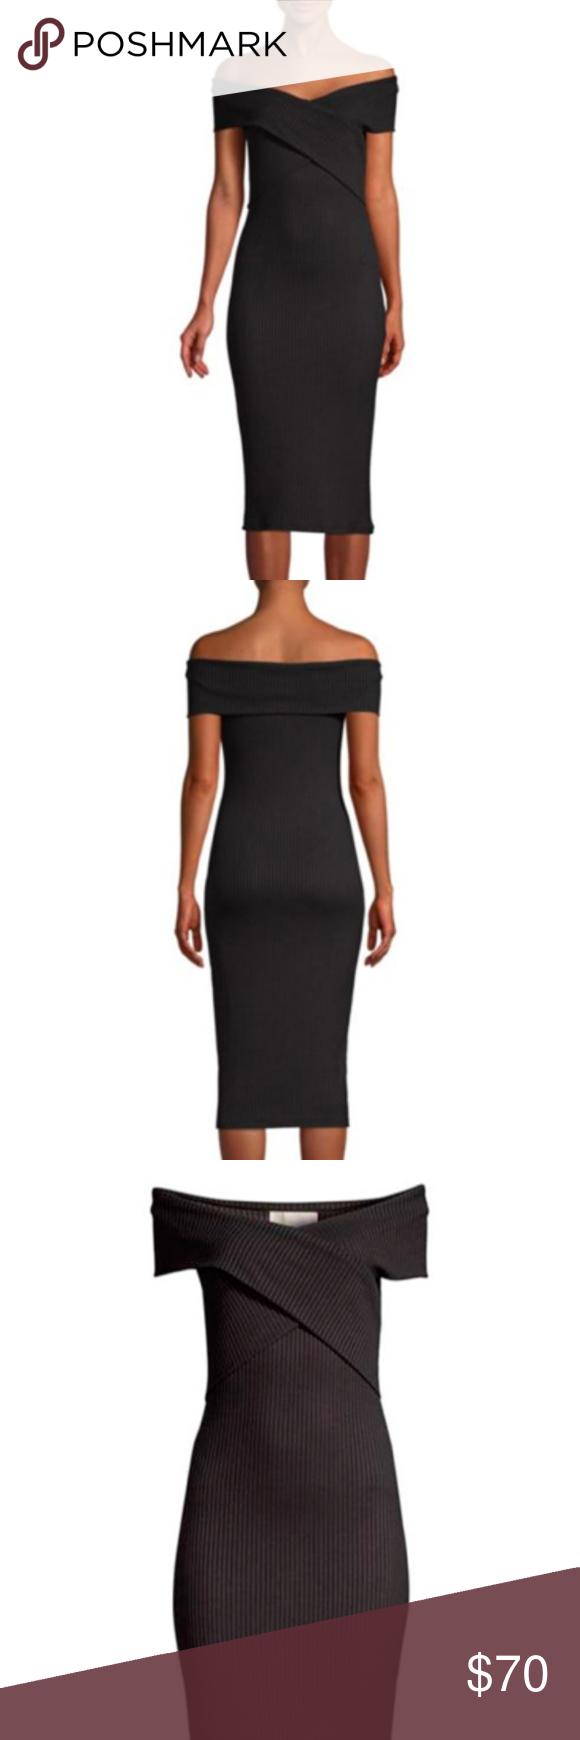 Michael Kors Core Of Kors Black Ribbed Dress Xl Ribbed Dresses Ribbed Knit Dress Black Rib [ 1740 x 580 Pixel ]